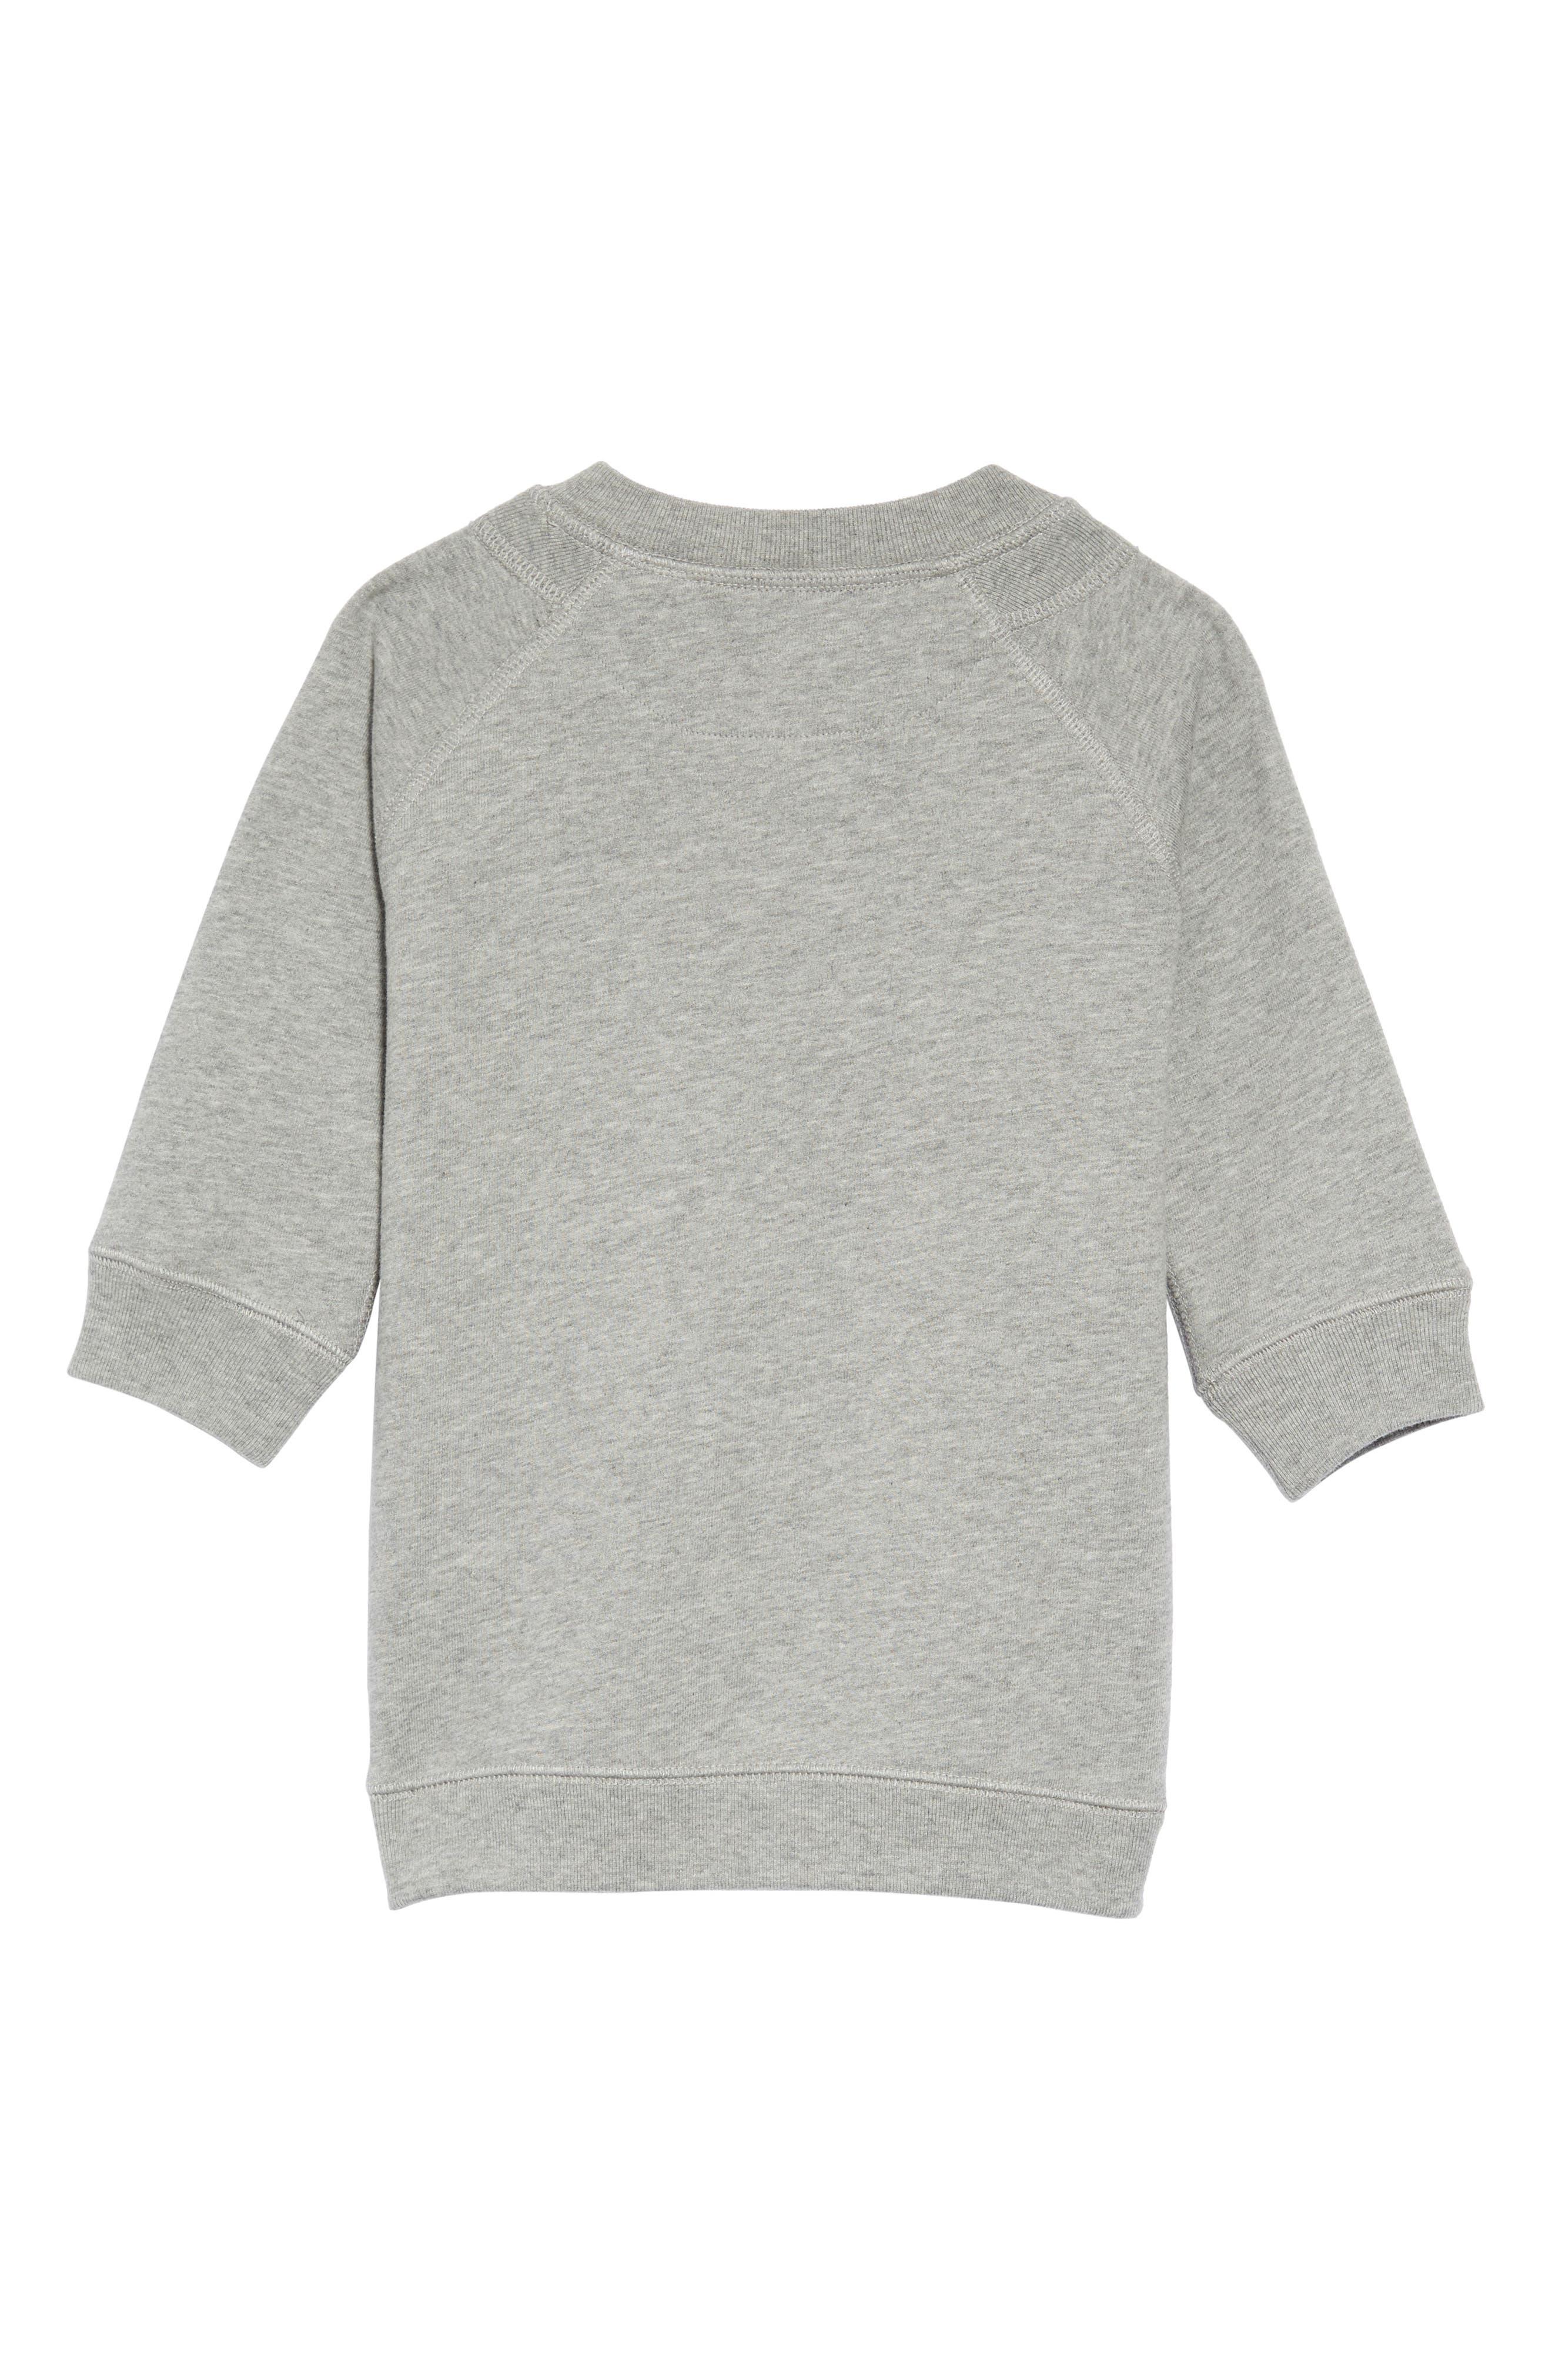 Mala Archive Logo Sweatshirt Dress,                             Alternate thumbnail 2, color,                             GREY MELANGE